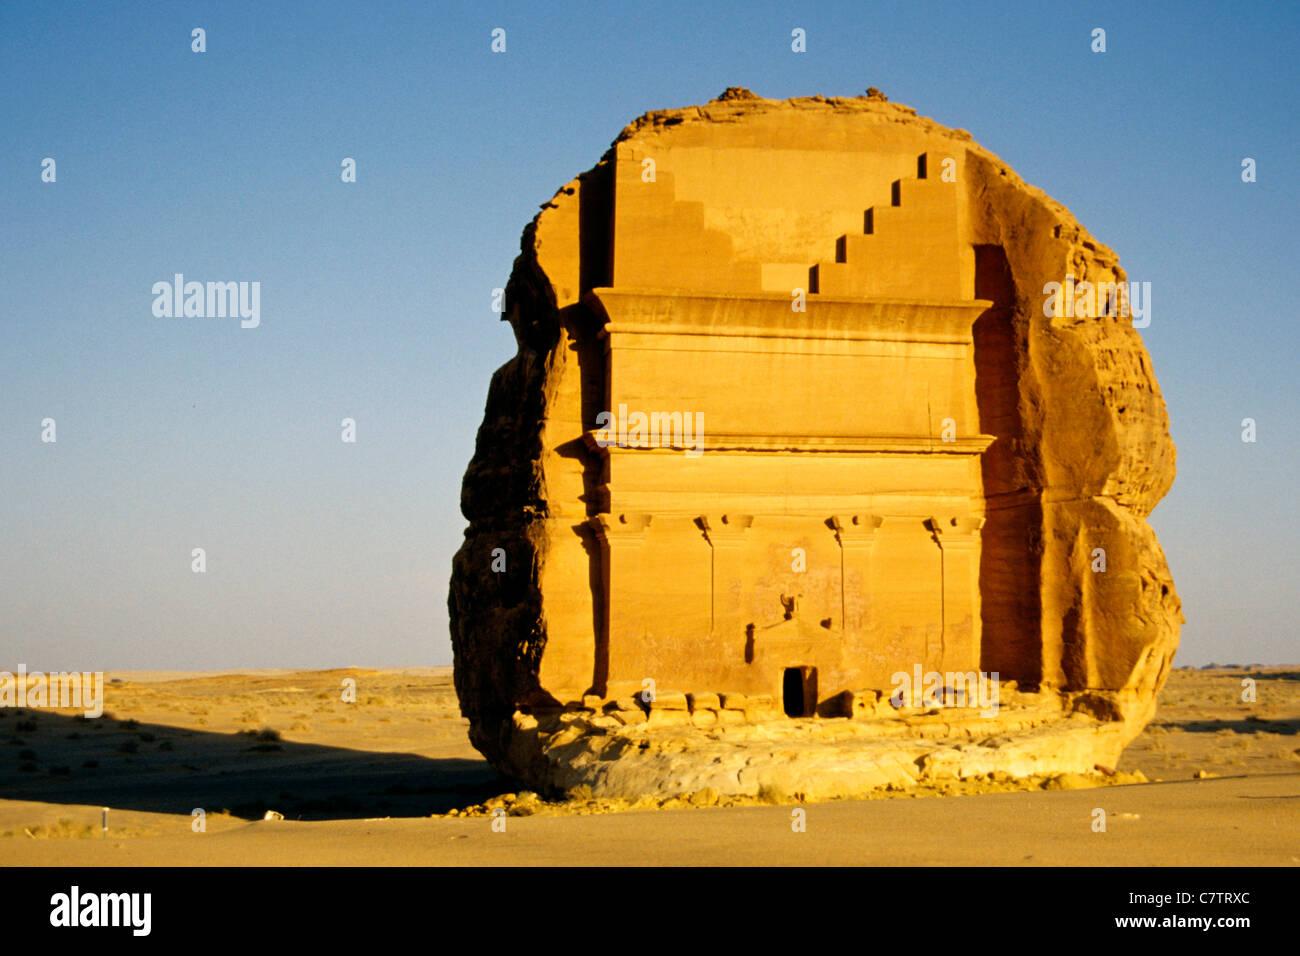 Saudi Arabia, Dedan - Stock Image